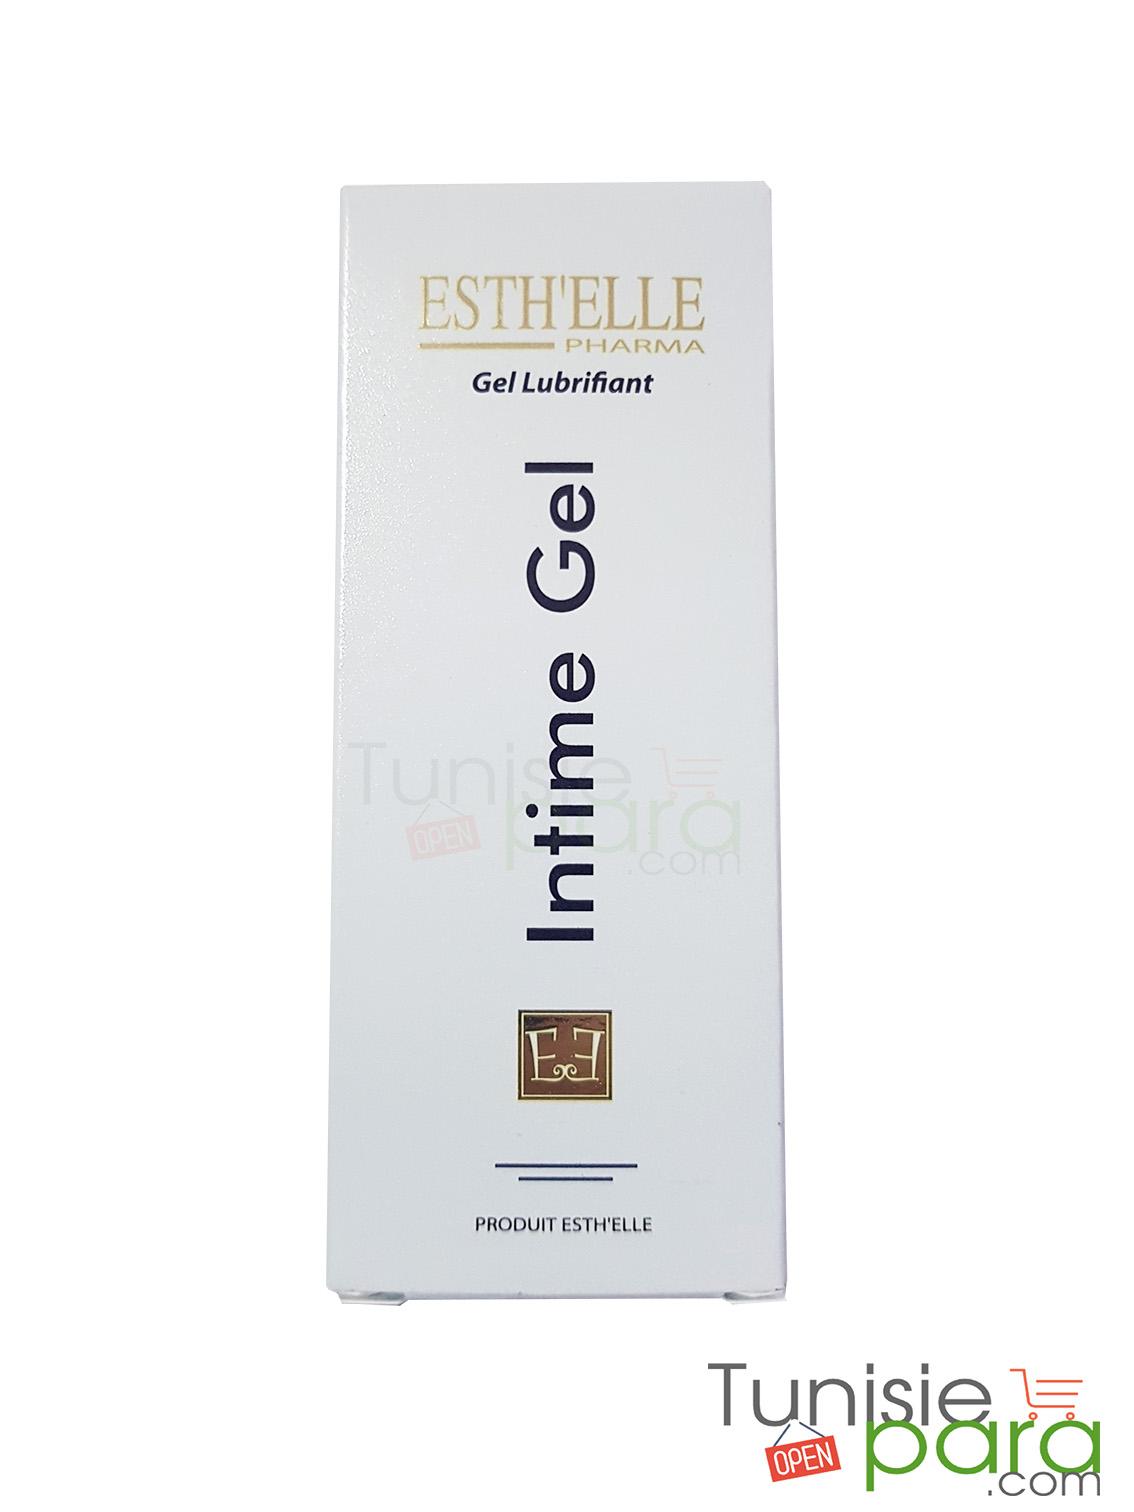 gel lubrifiant tunisie